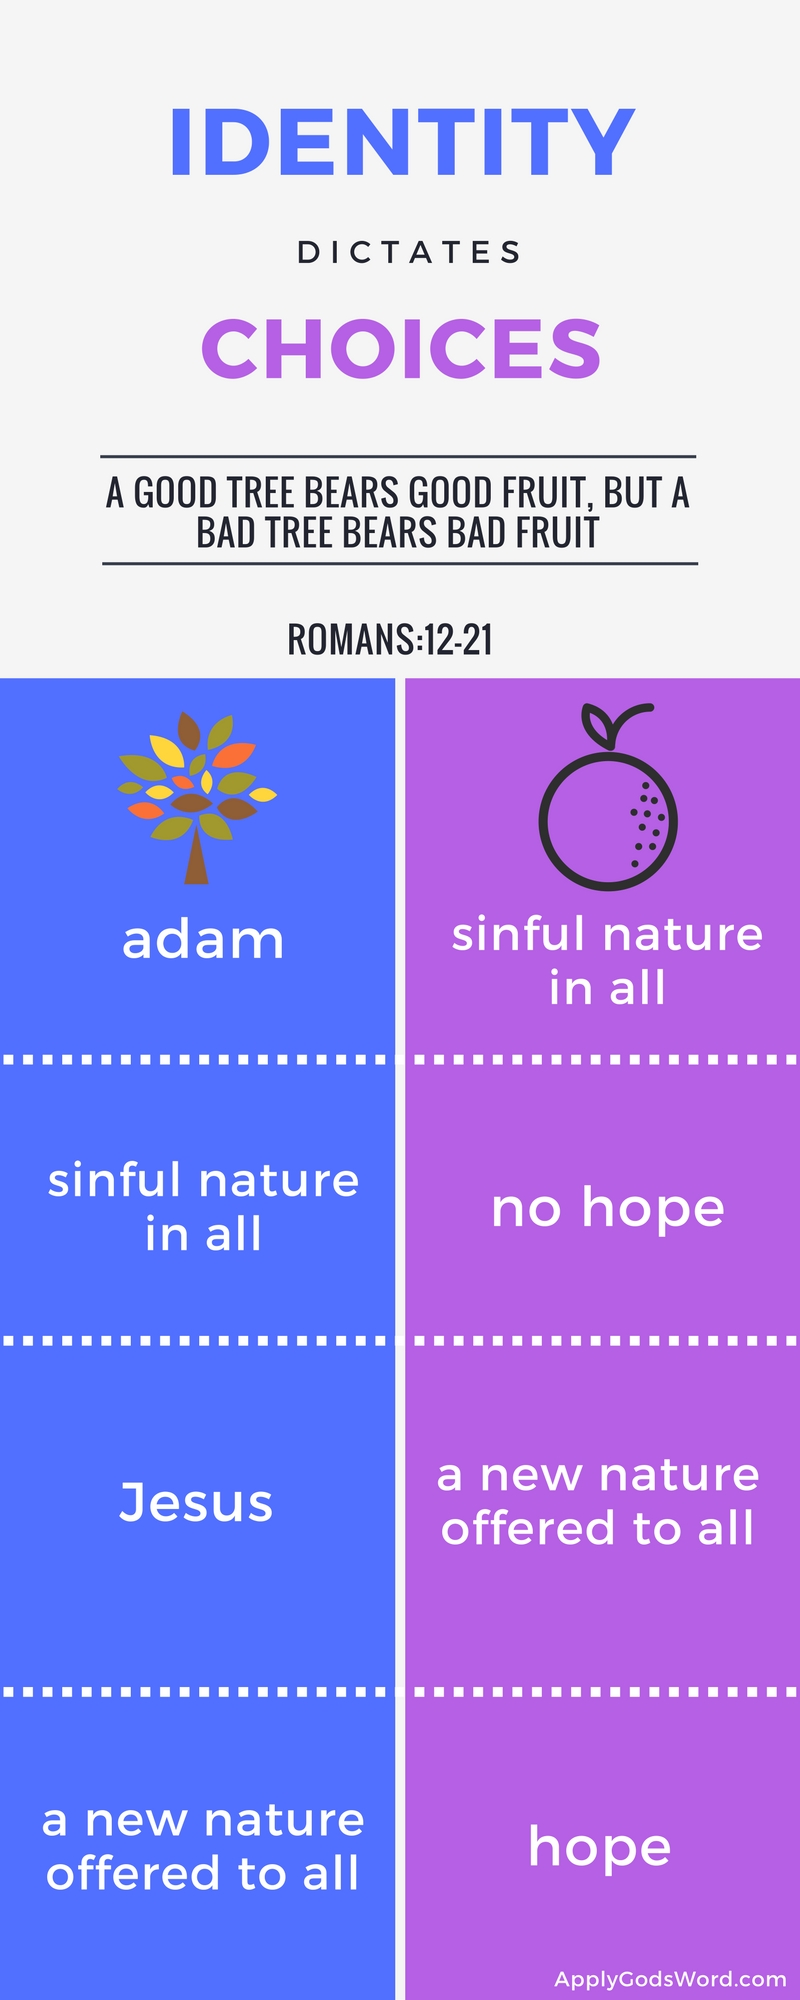 my identity in Christ